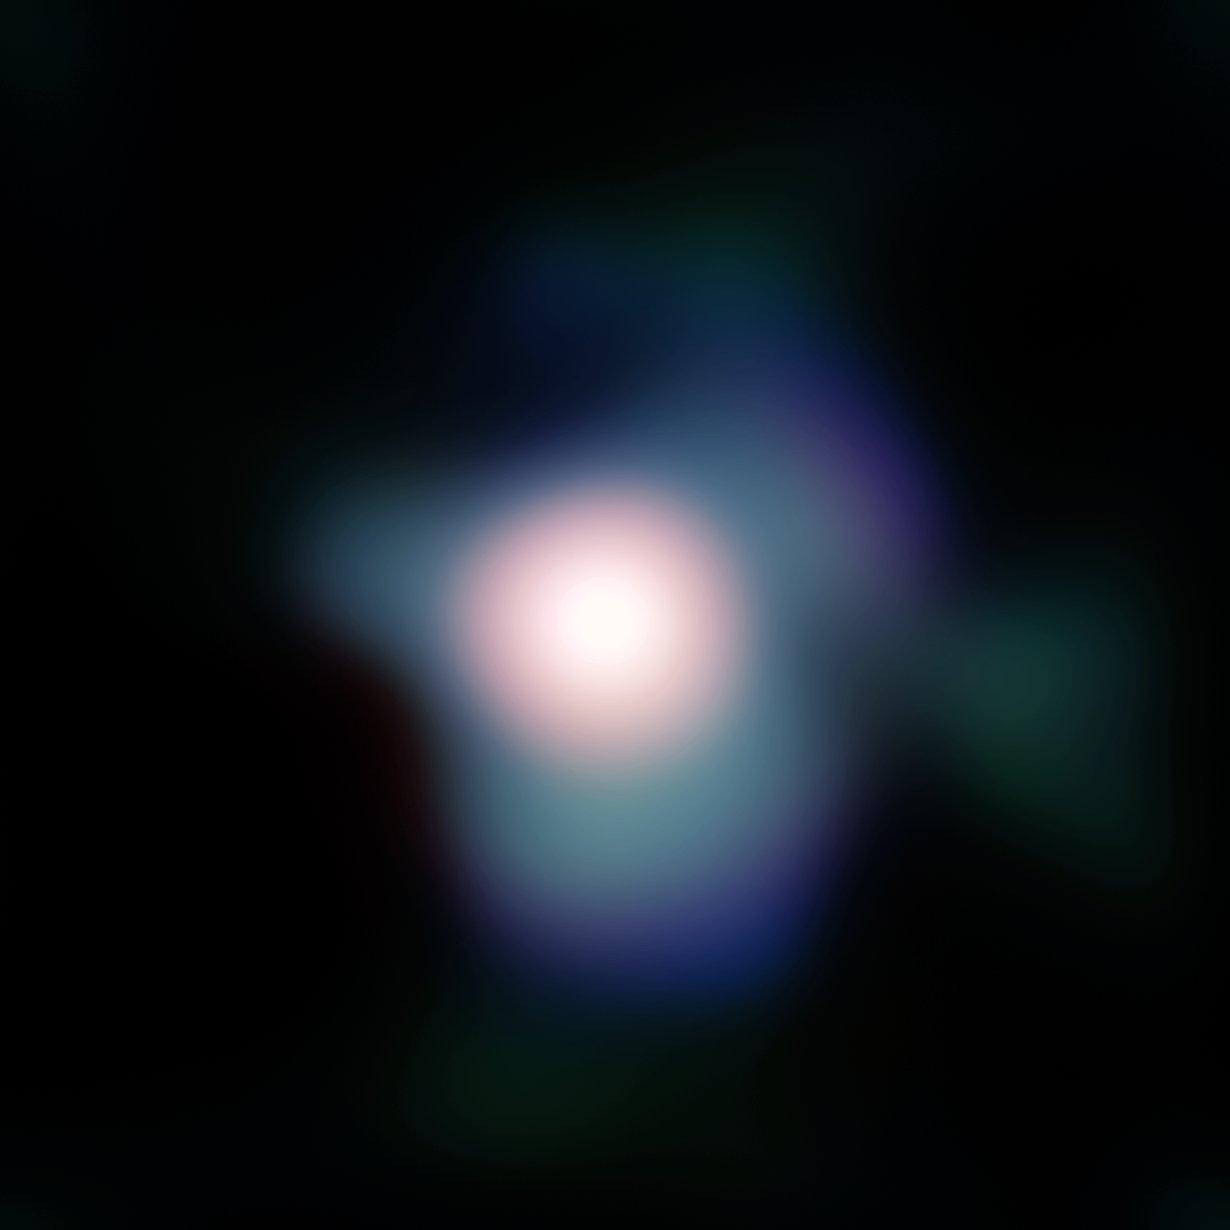 APOD: 2009 August 5 - Betelgeuse Resolved